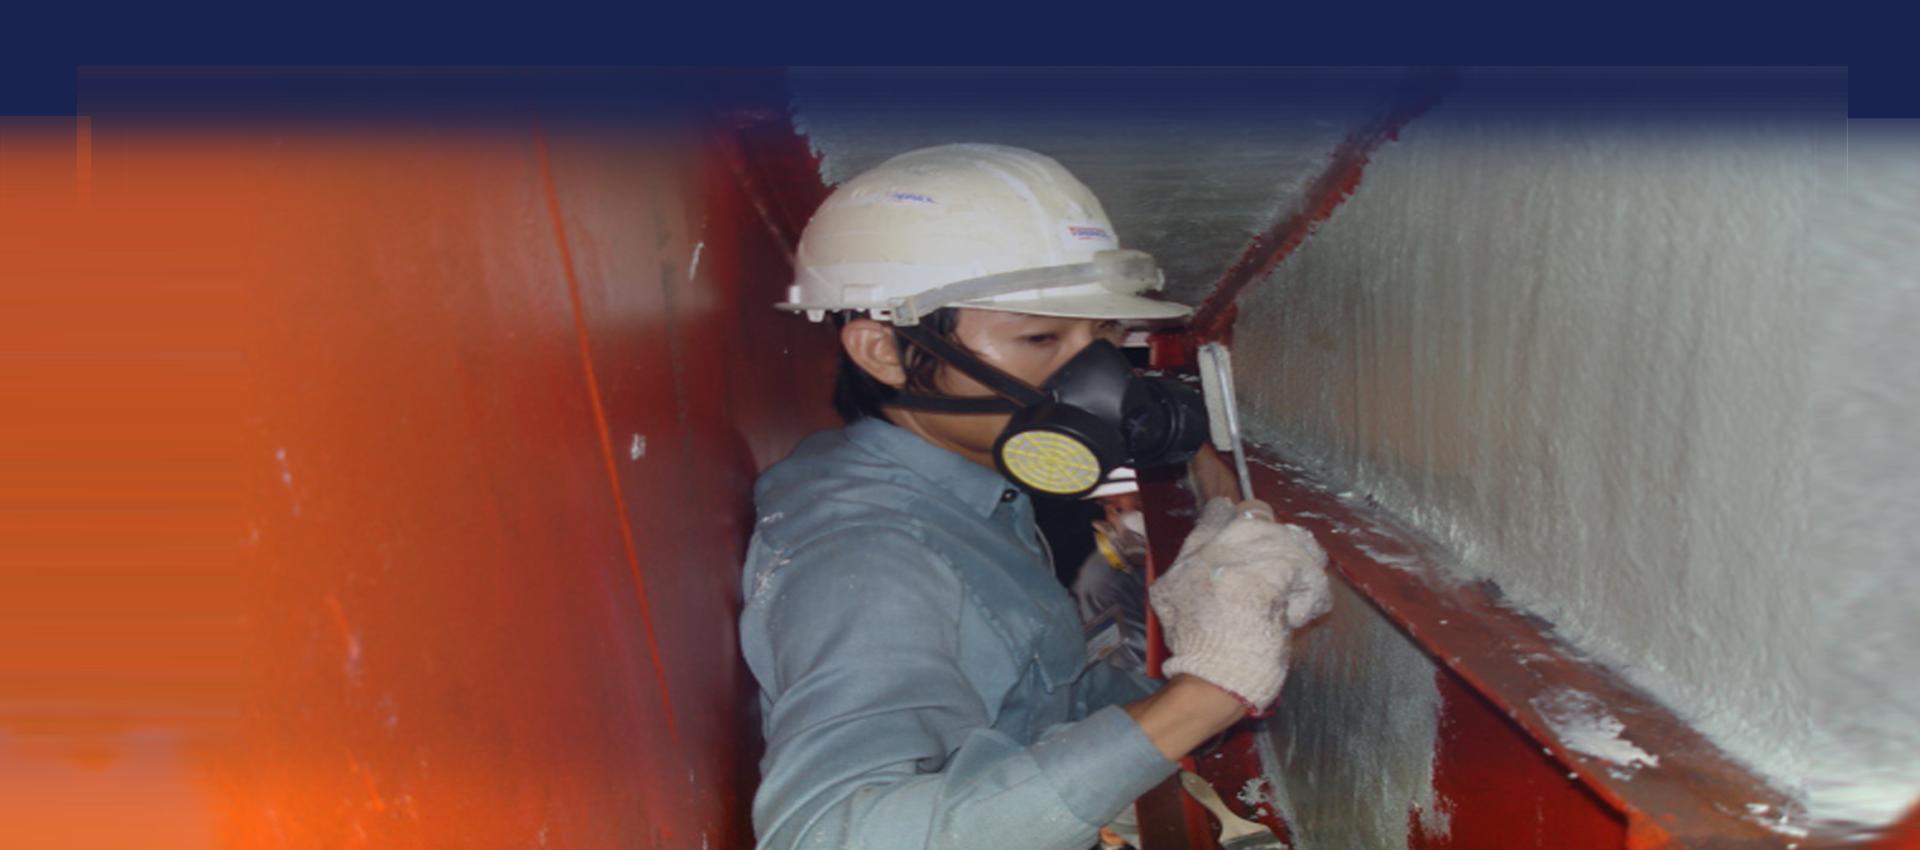 Vinyl ester heavy duty chemical resistant lining system KERAGUARD VR300